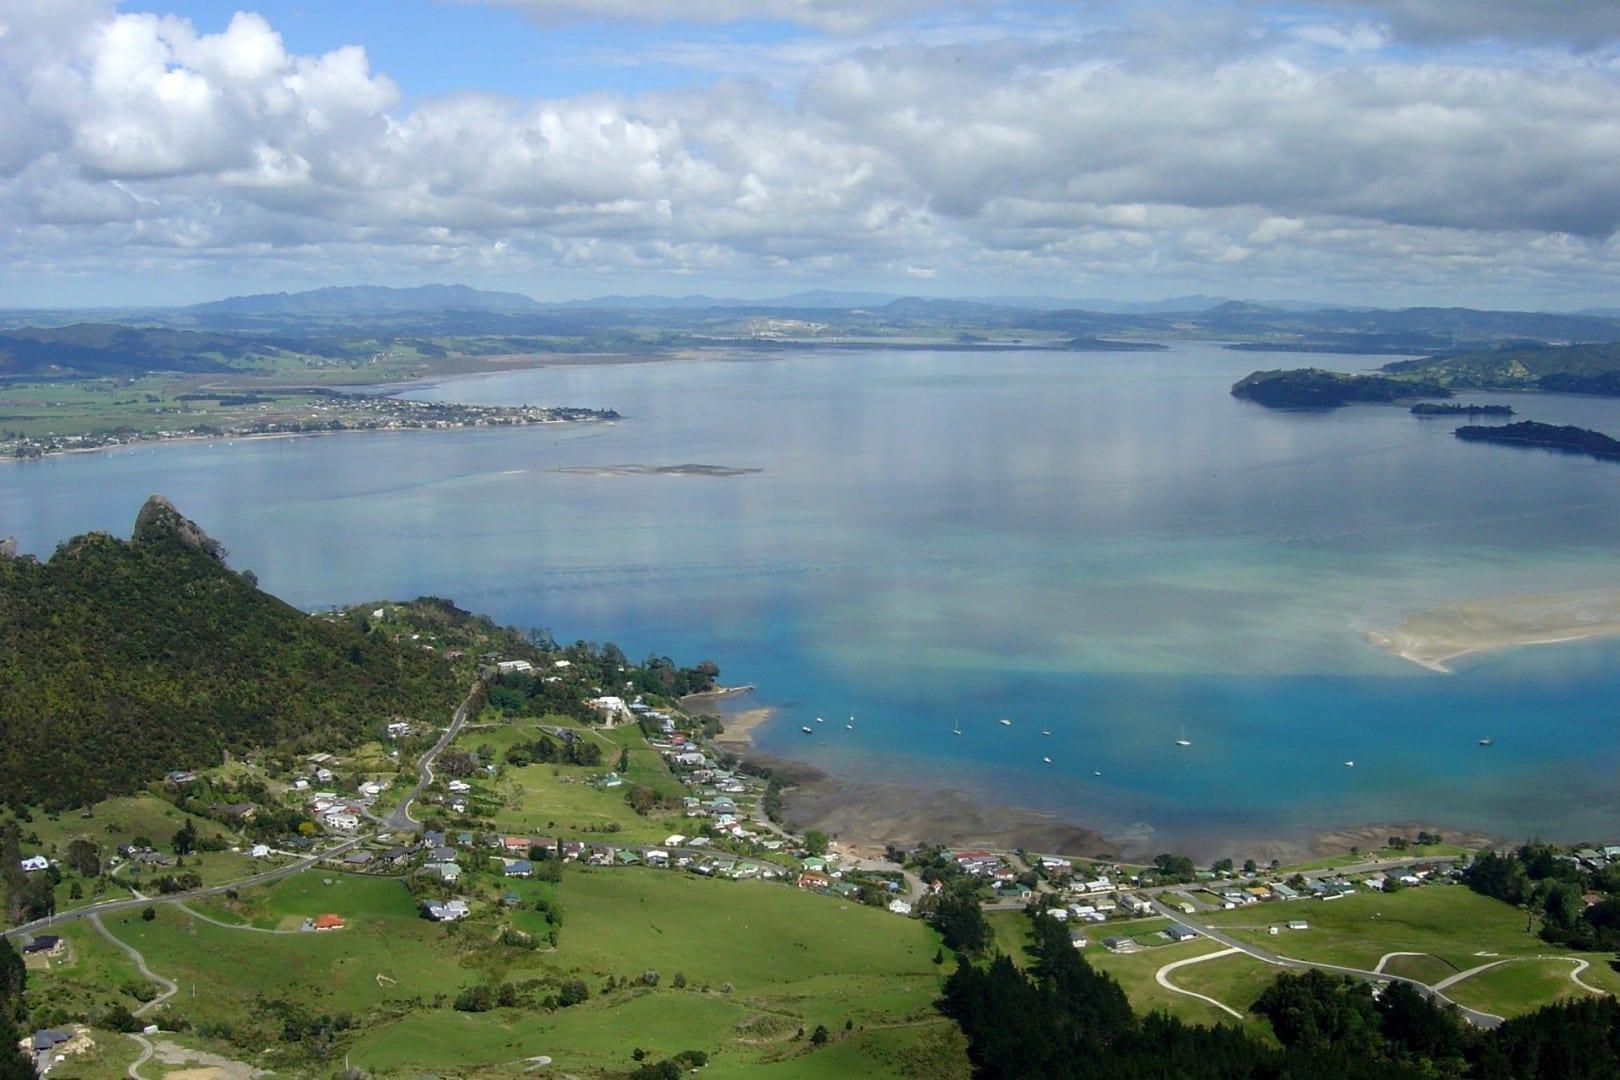 El puerto de Whangarei del Monte Manaia Whangarei Nueva Zelanda